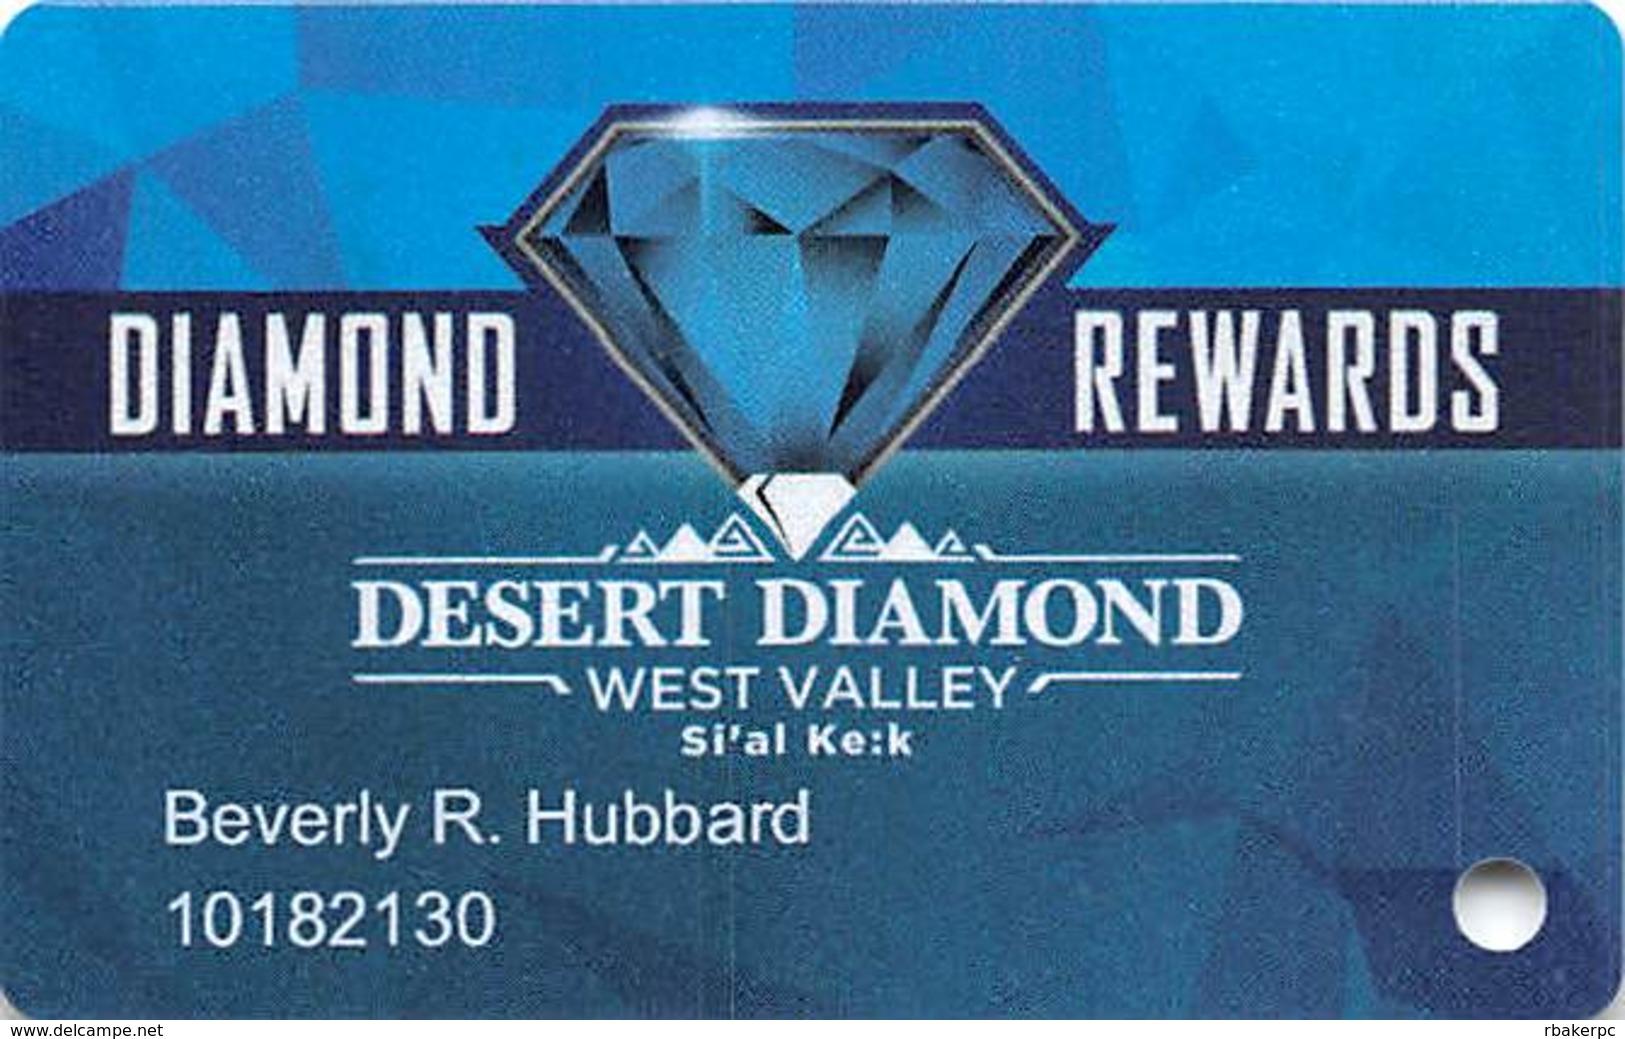 Desert Diamond West Valley Casino - Glendale, AZ - Slot Card - Casino Cards